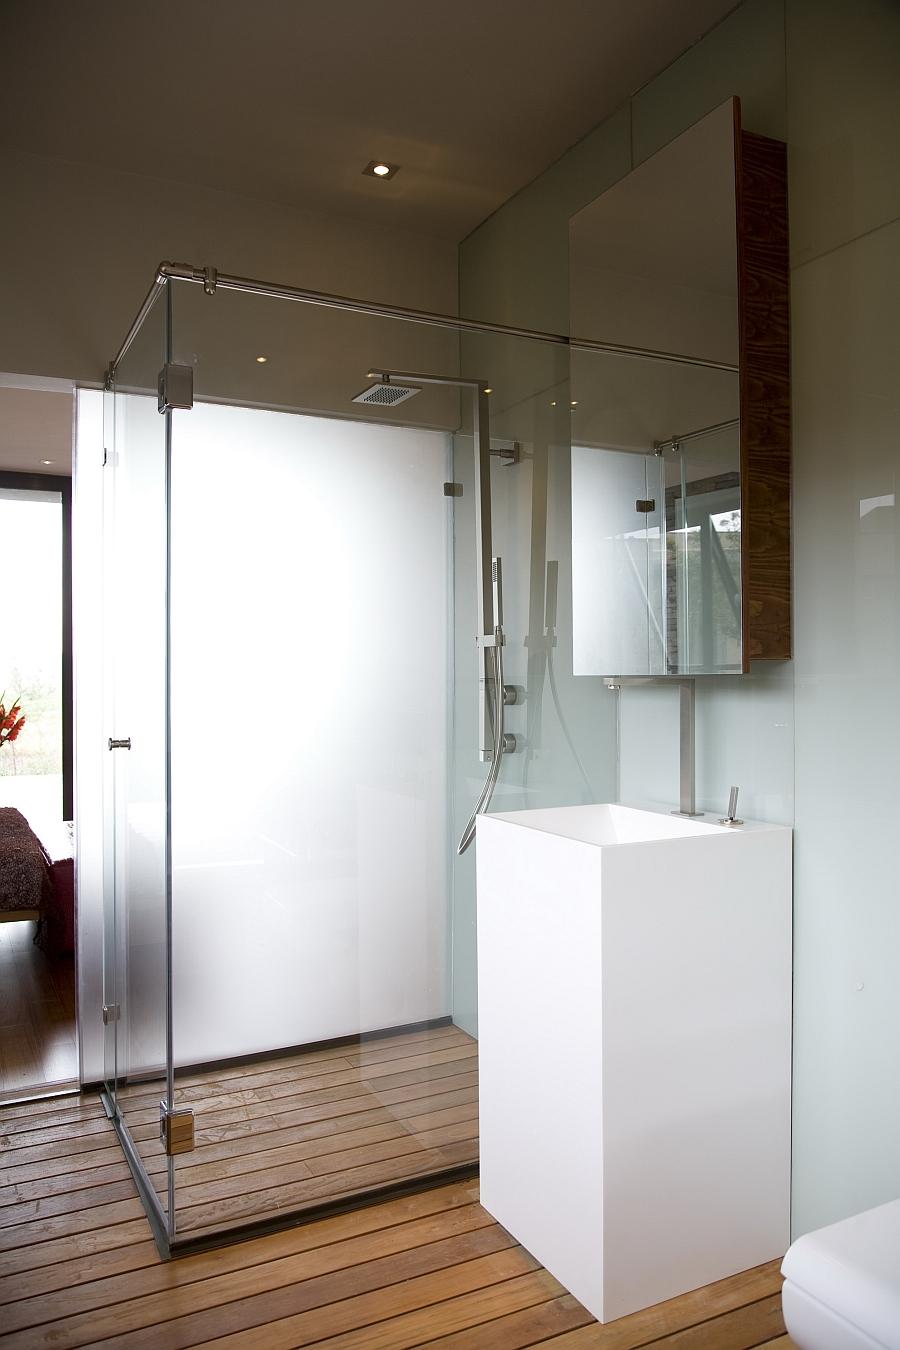 Glass shower enclosure idea for modern bathroom